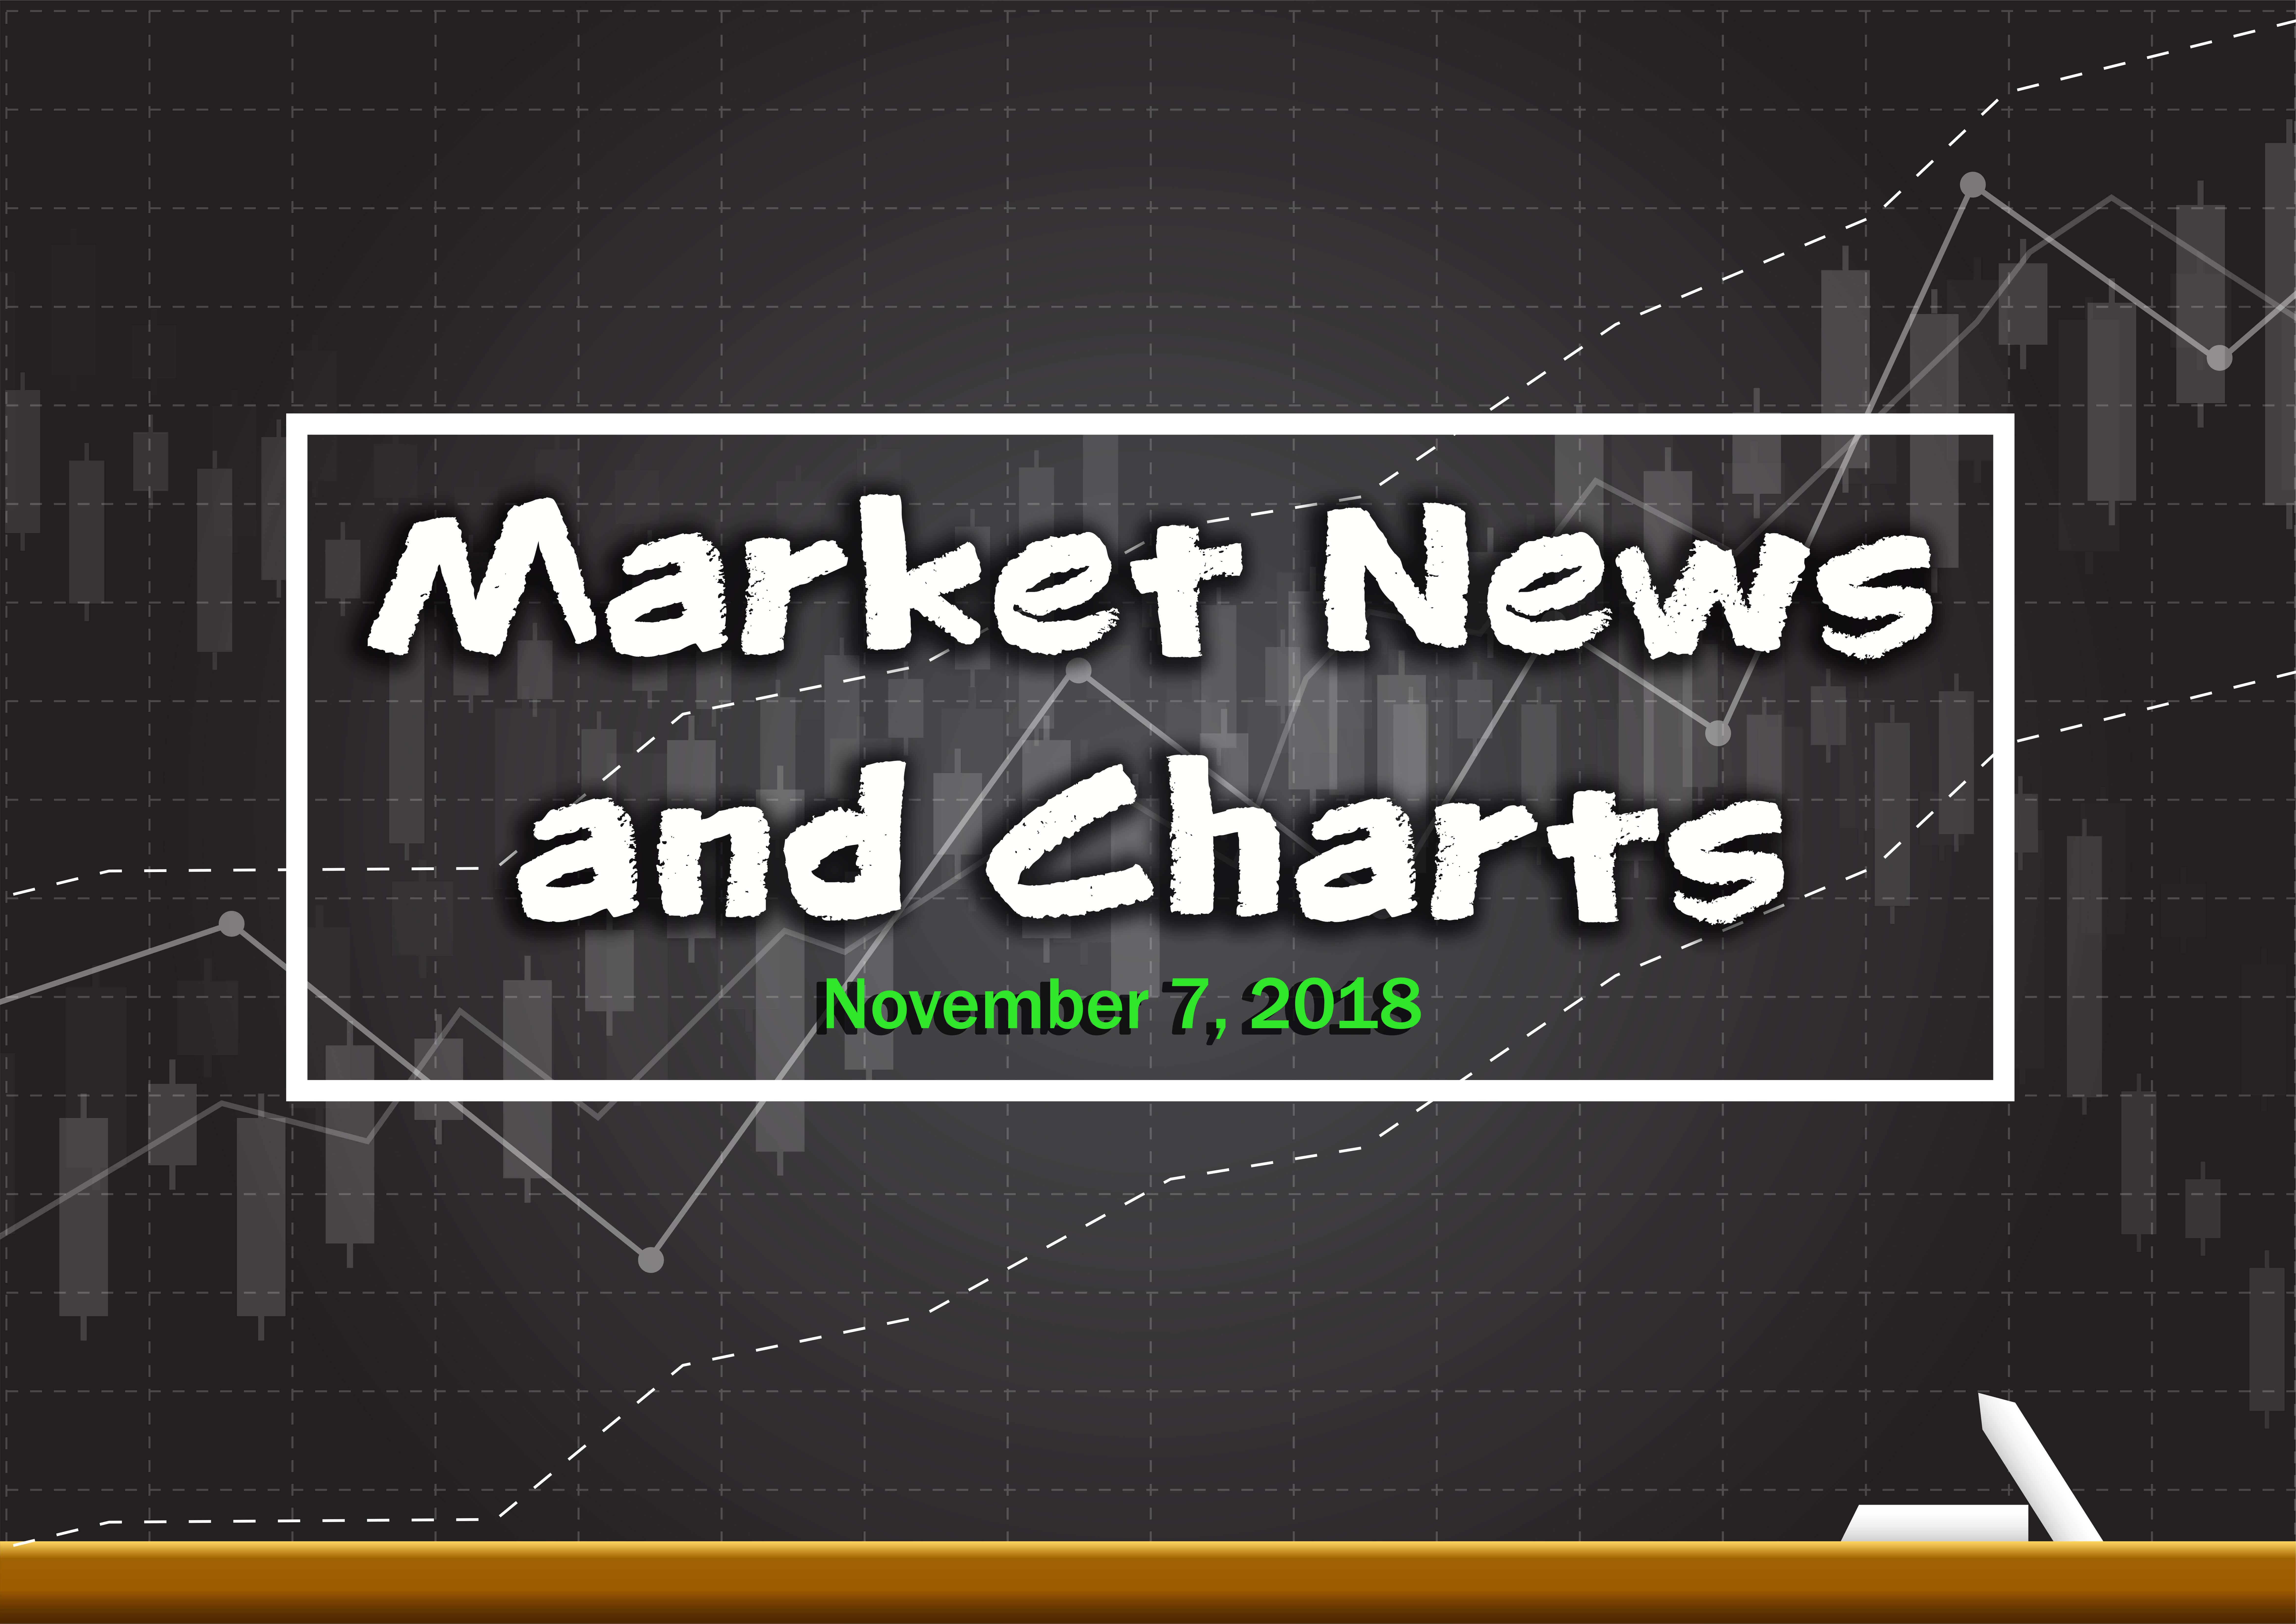 FinanceBrokerage - Market News and Charts for November 7, 2018